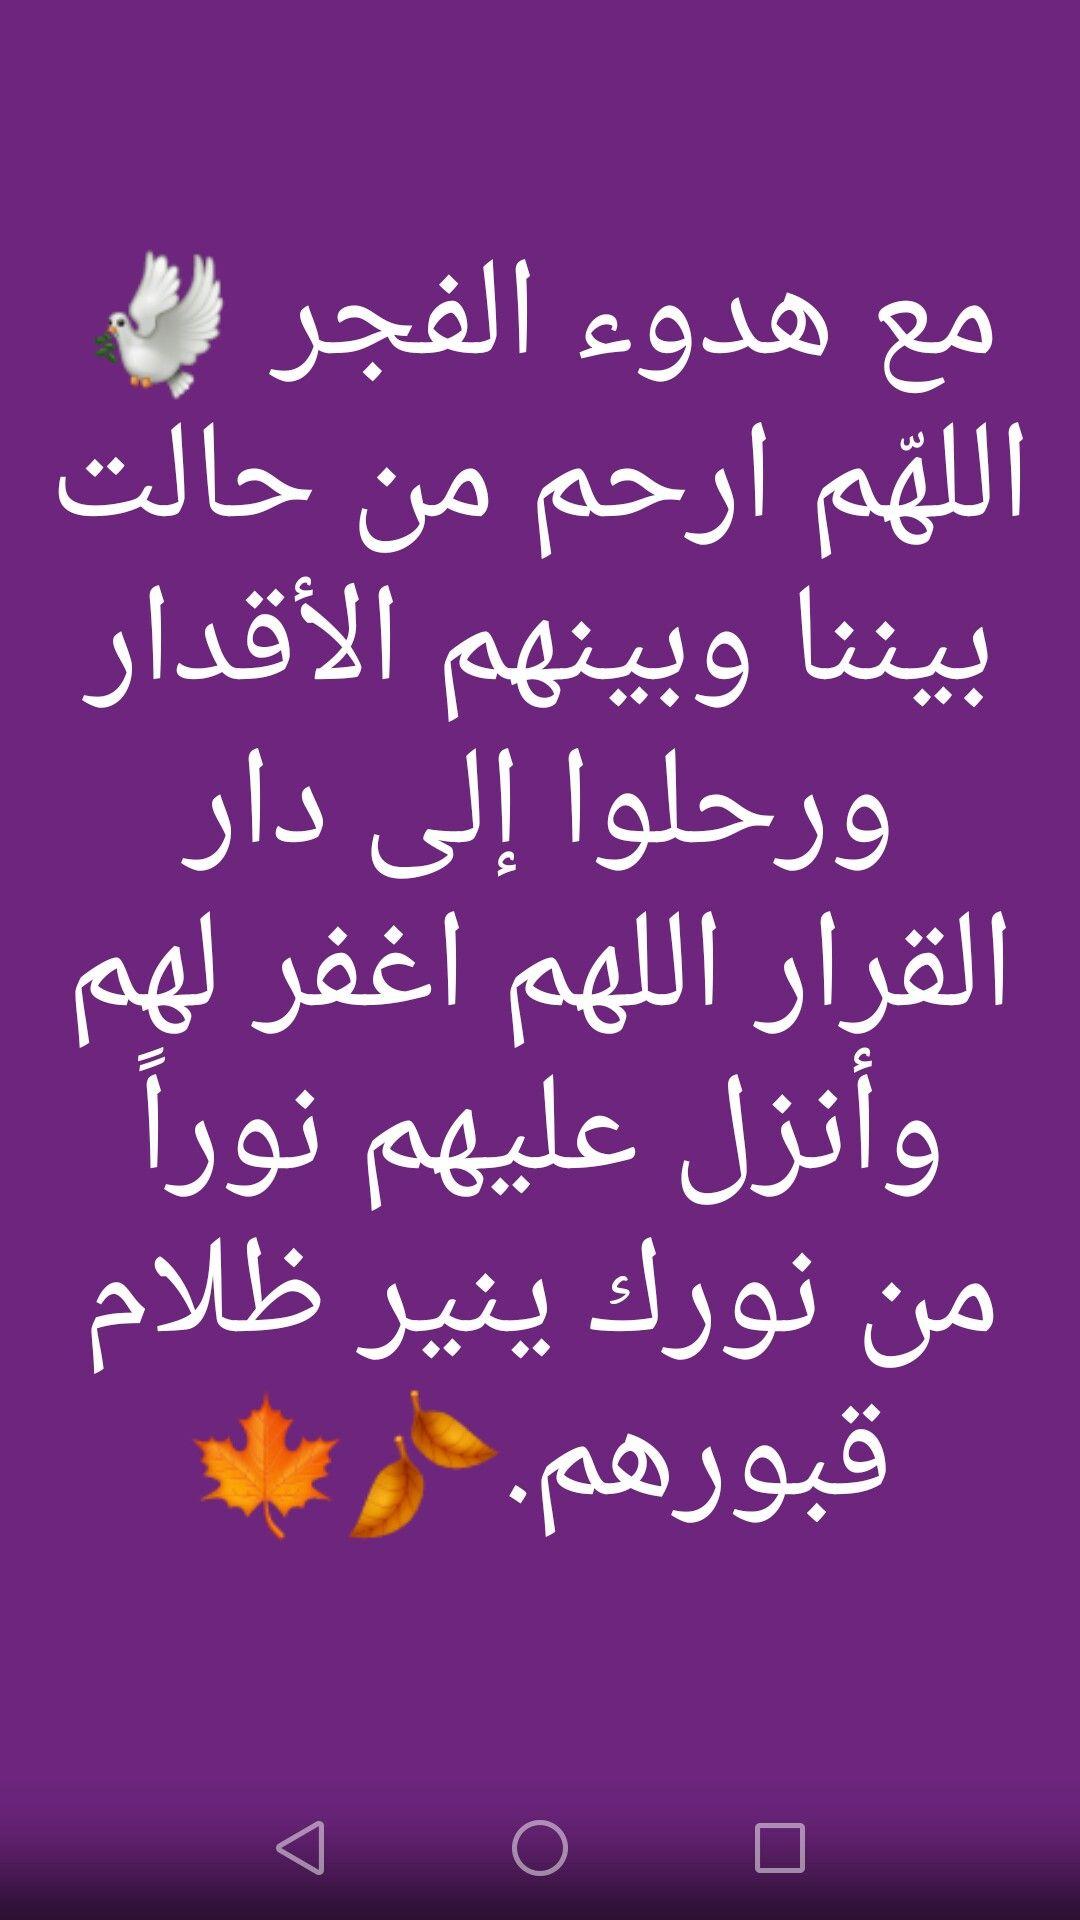 Pin By وعد العيون On ادعيه وابتهالات Quran Quotes Quran Quotes Love Arabic Quotes